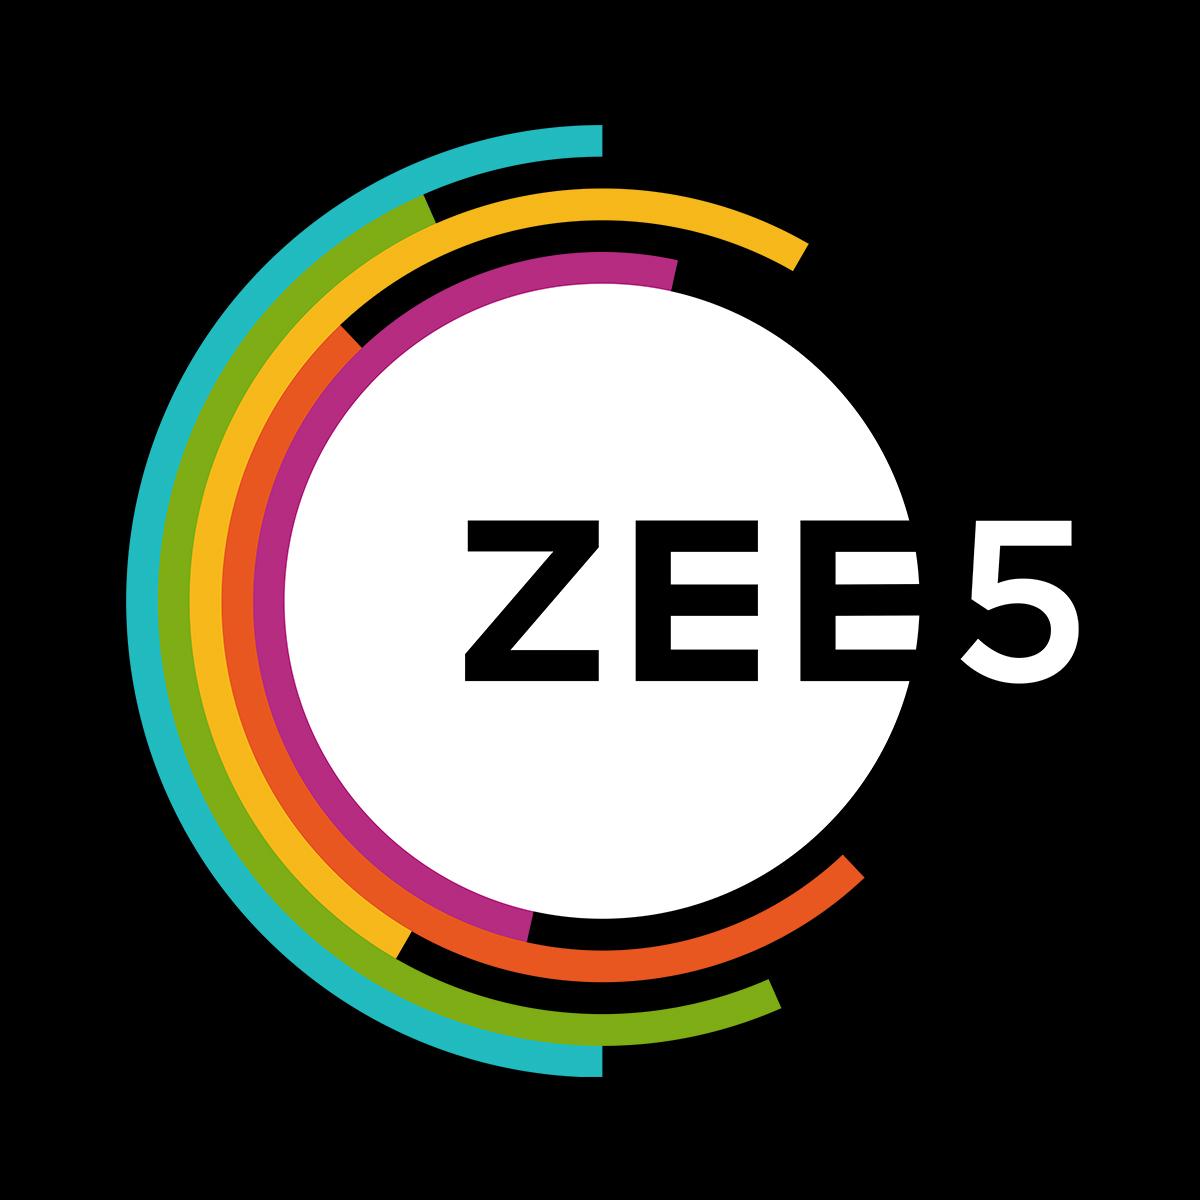 ZEE5 Lockdown Episode 3 – A Musical Twist Like No Other